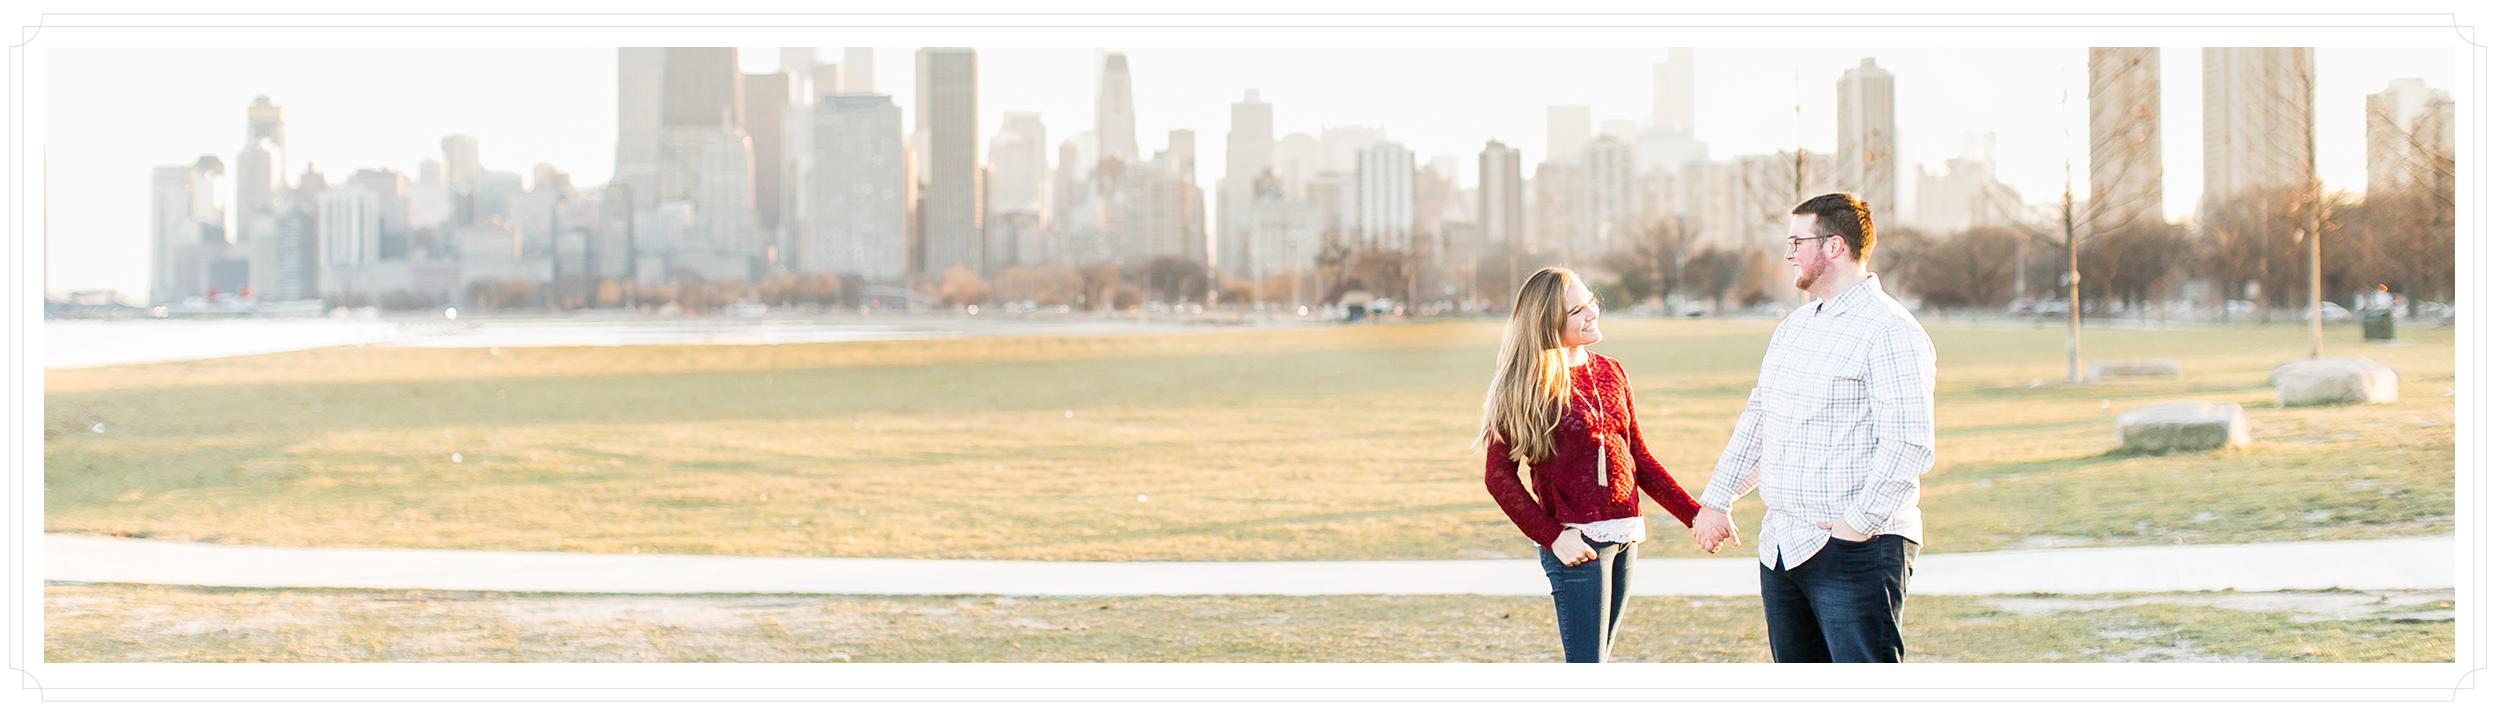 Chicago_engagement_Photos_chicago_skyline